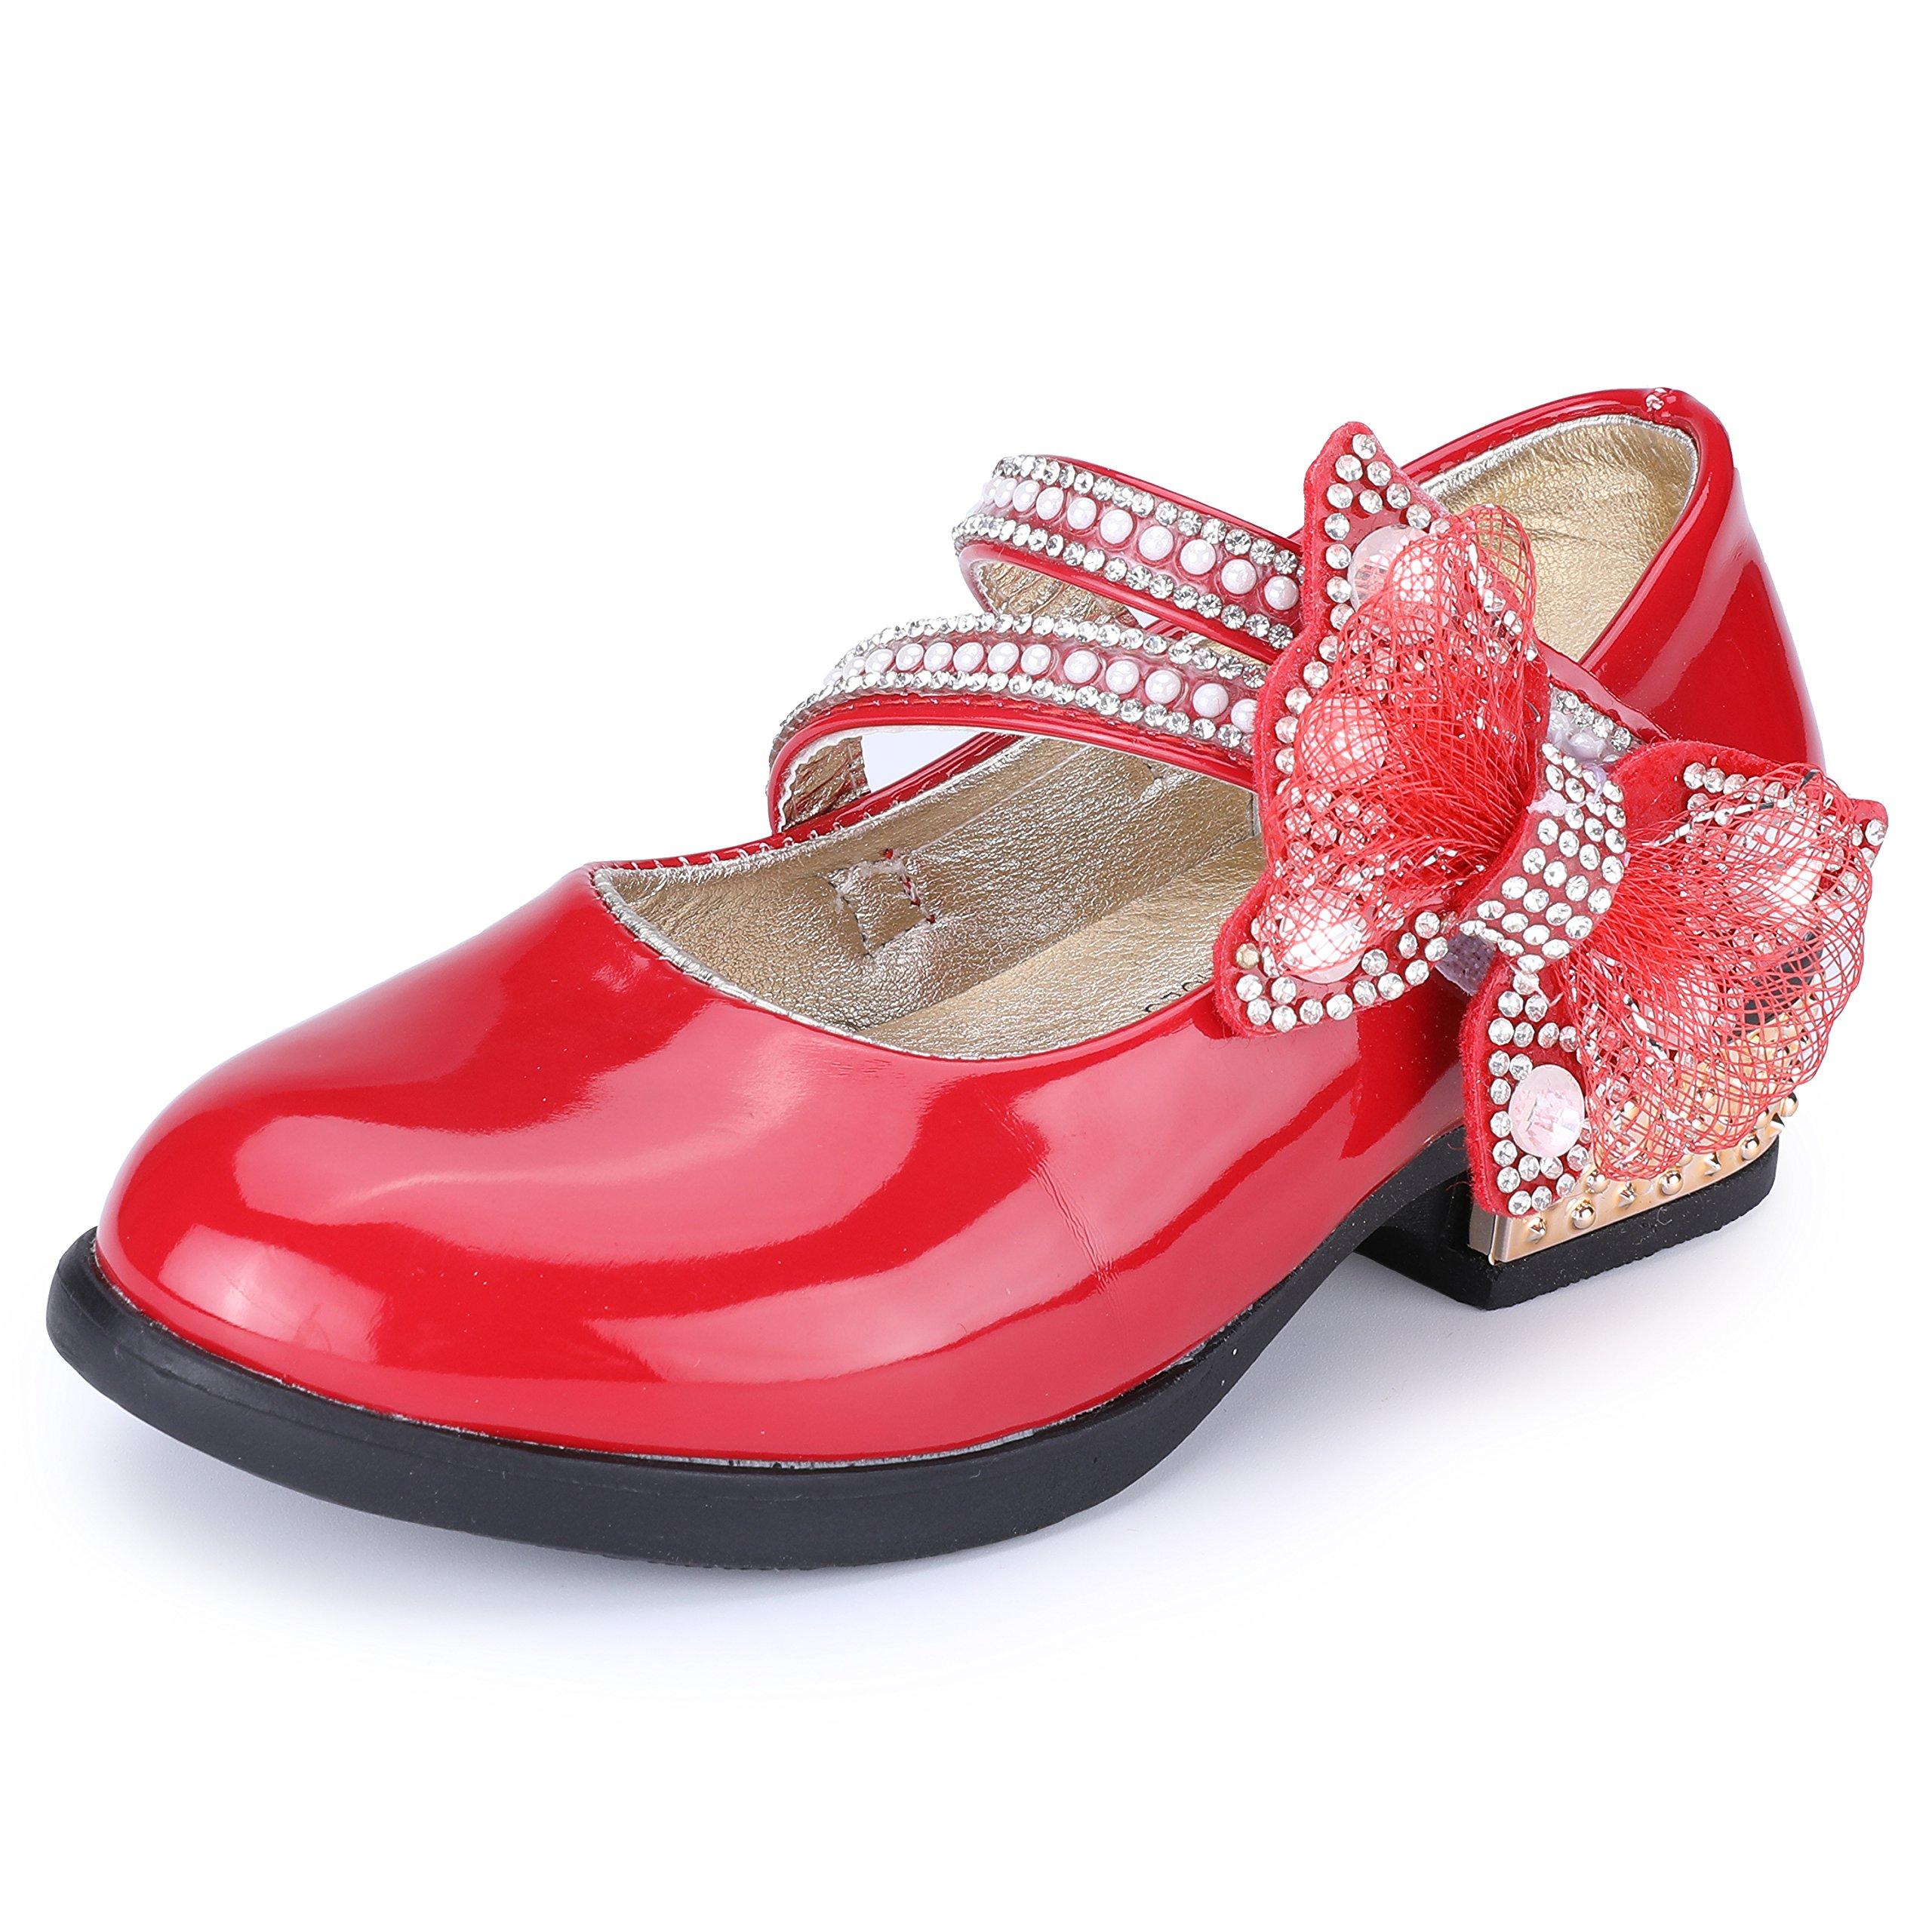 VECJUNIA Girls Rhinestones Bow Mary Janes Strap Flats Red 3 M US Little Kid